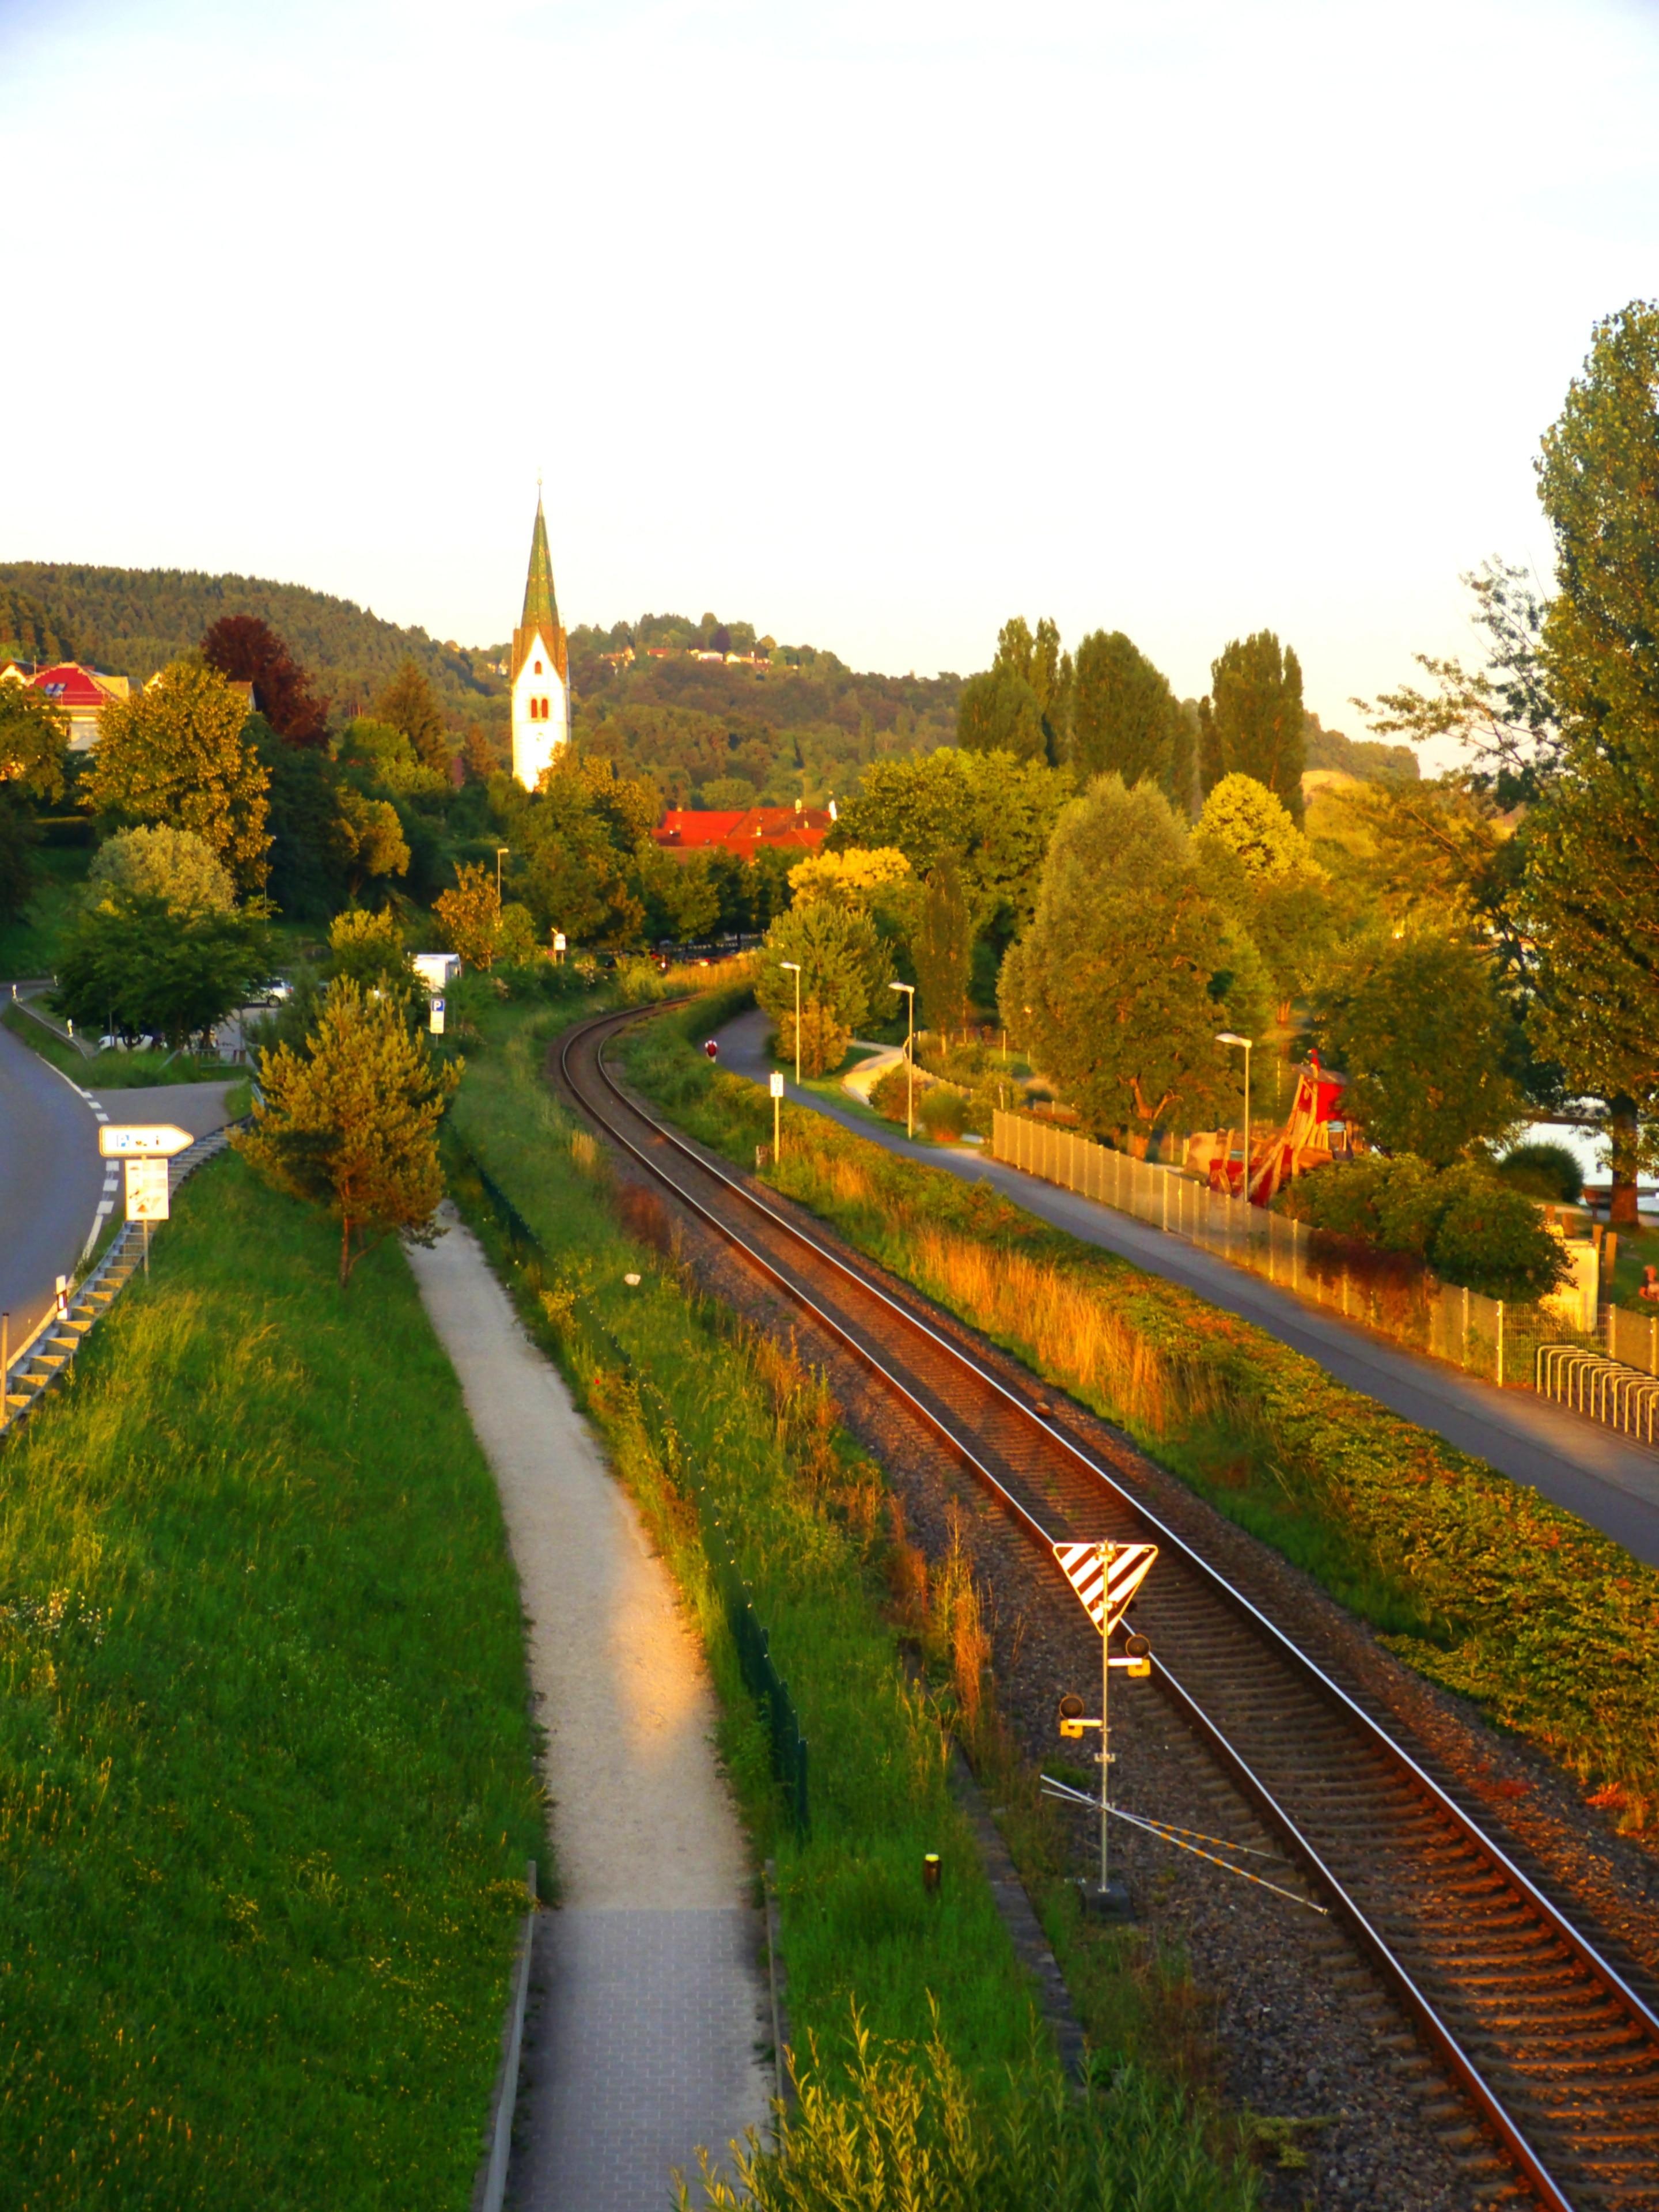 Sipplingen, Baden-Württemberg, Germany